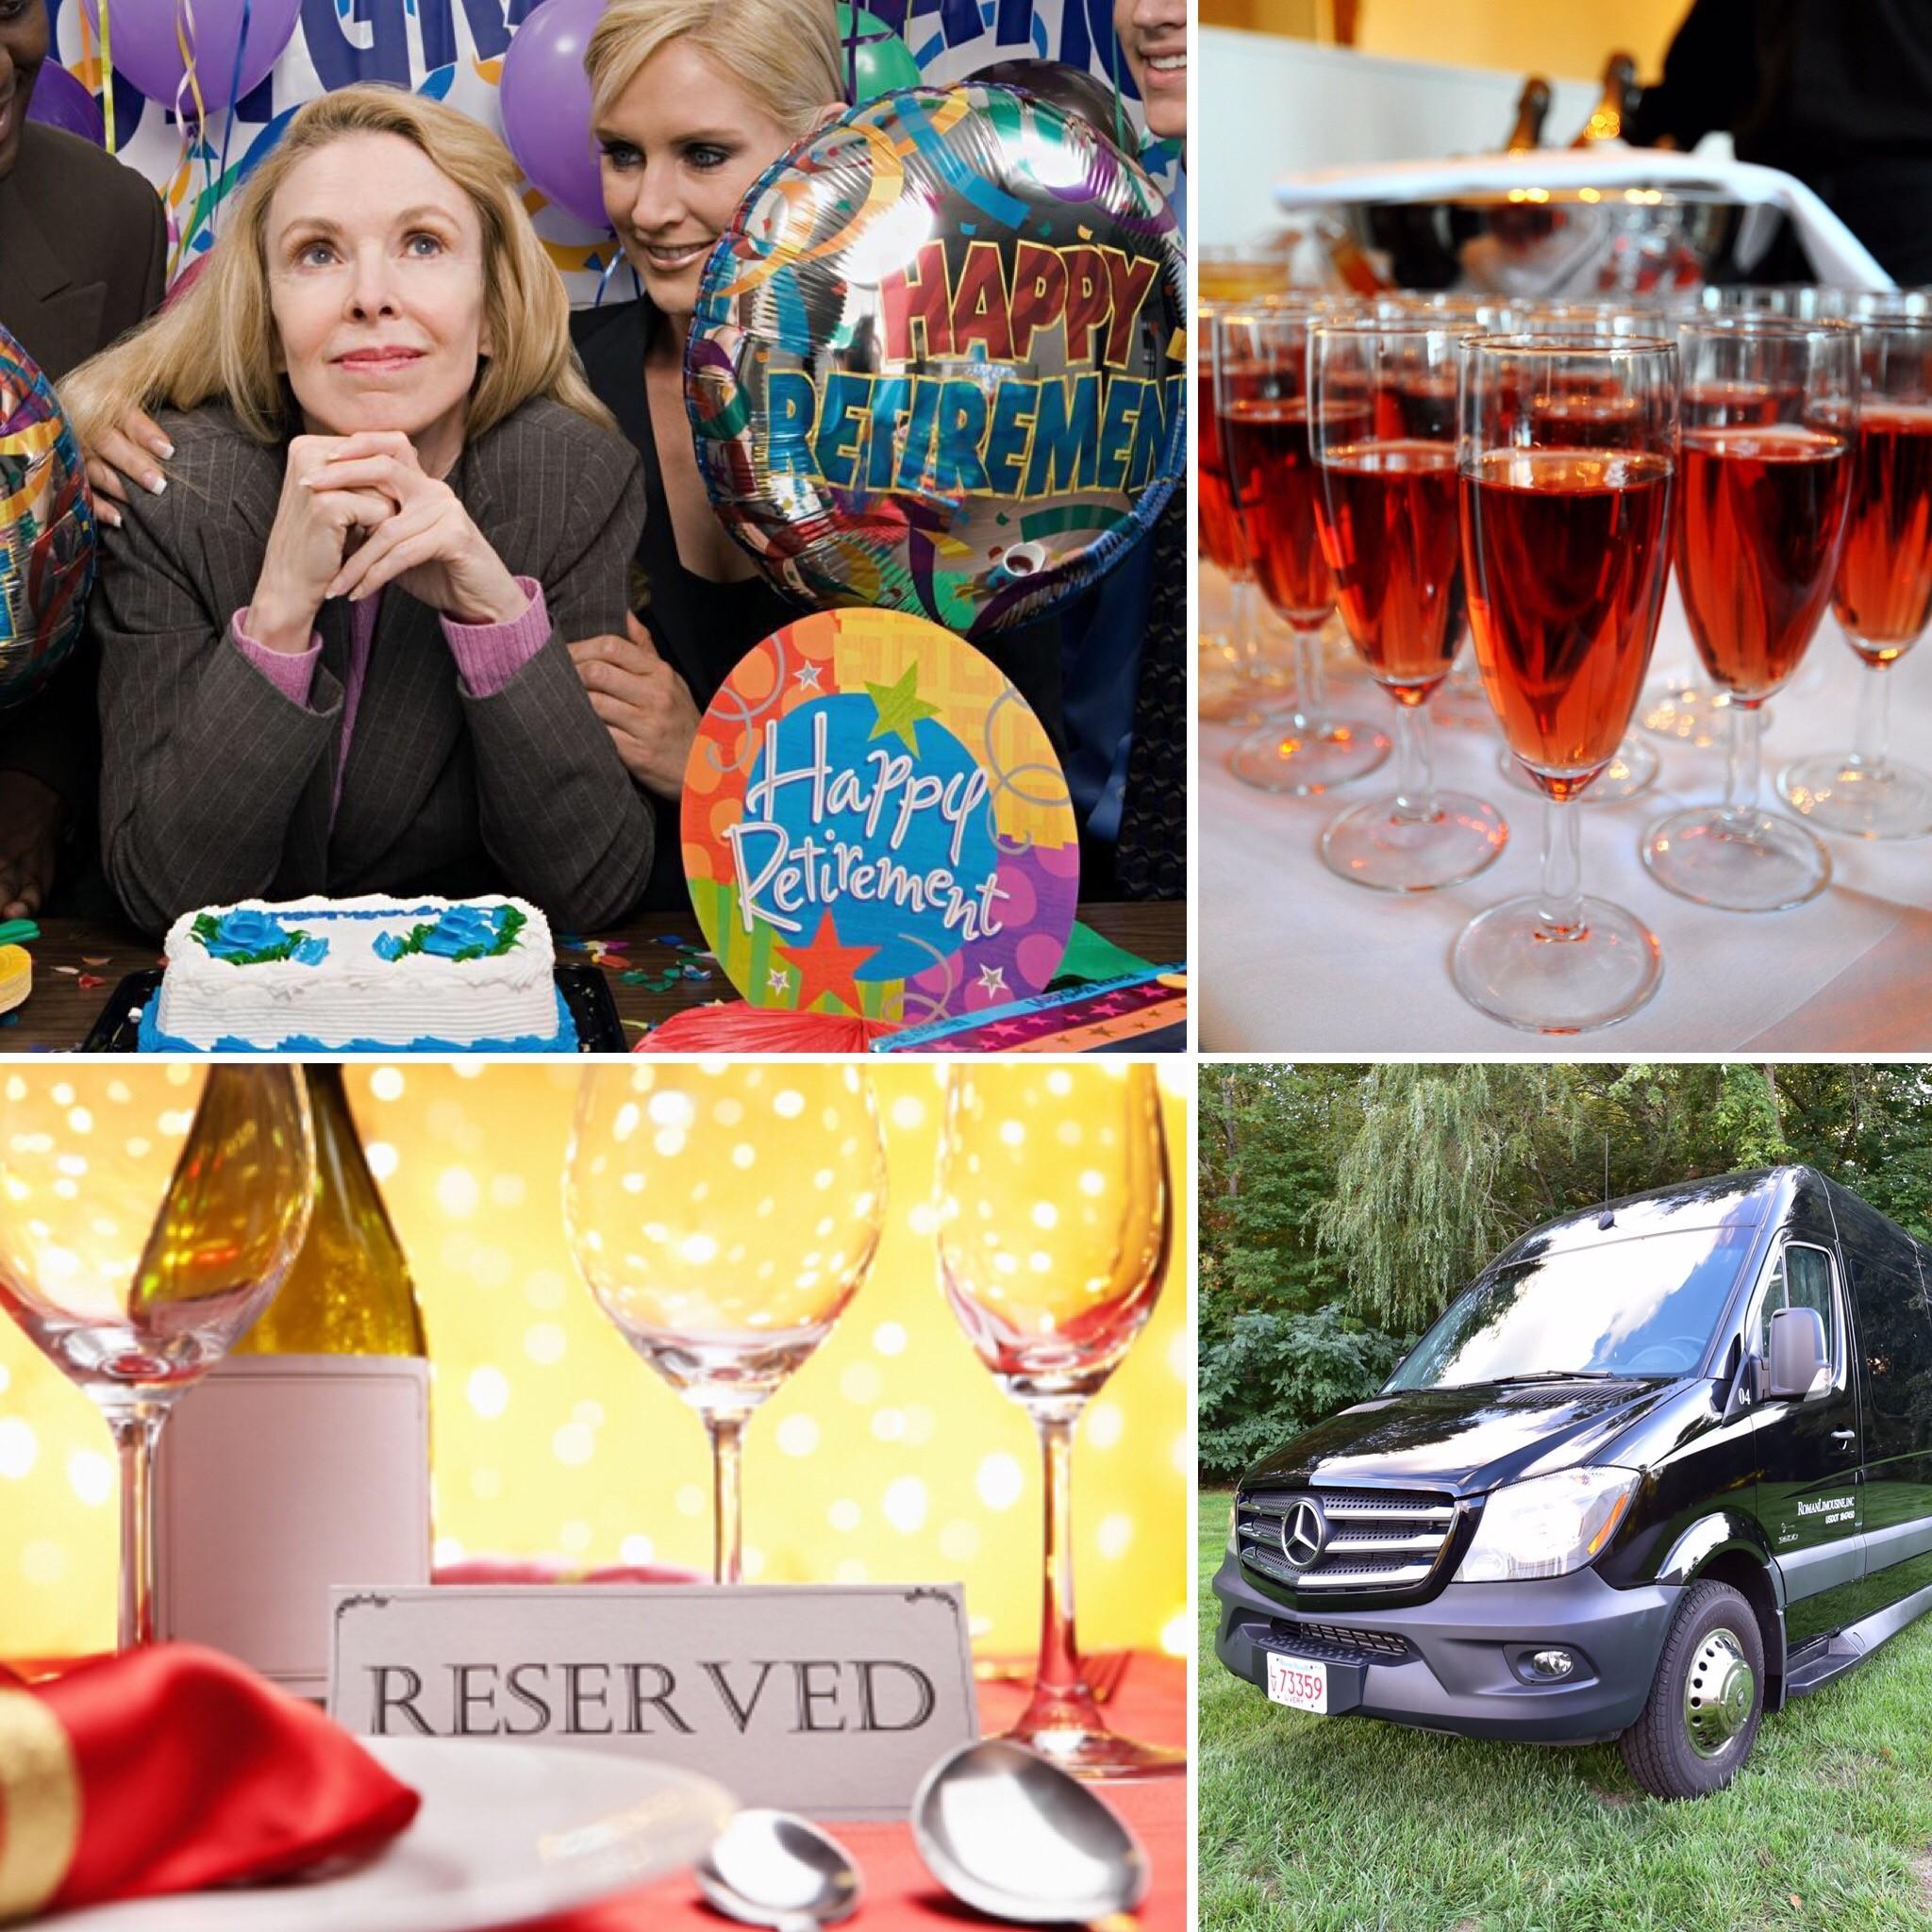 Retirement birthday party